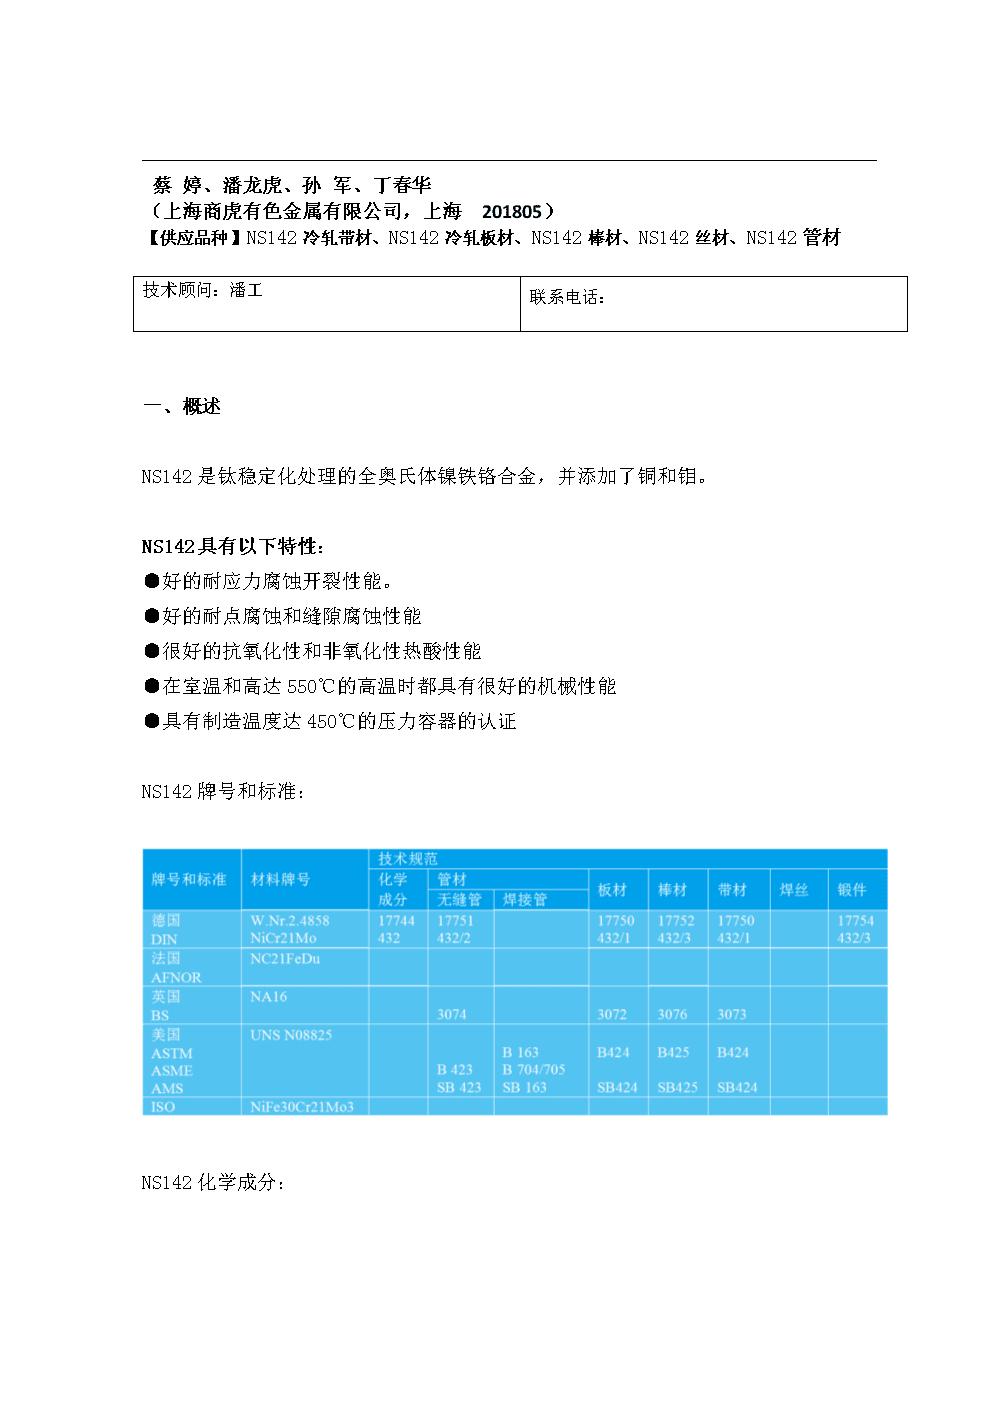 NS142-上海商虎合金技术.doc